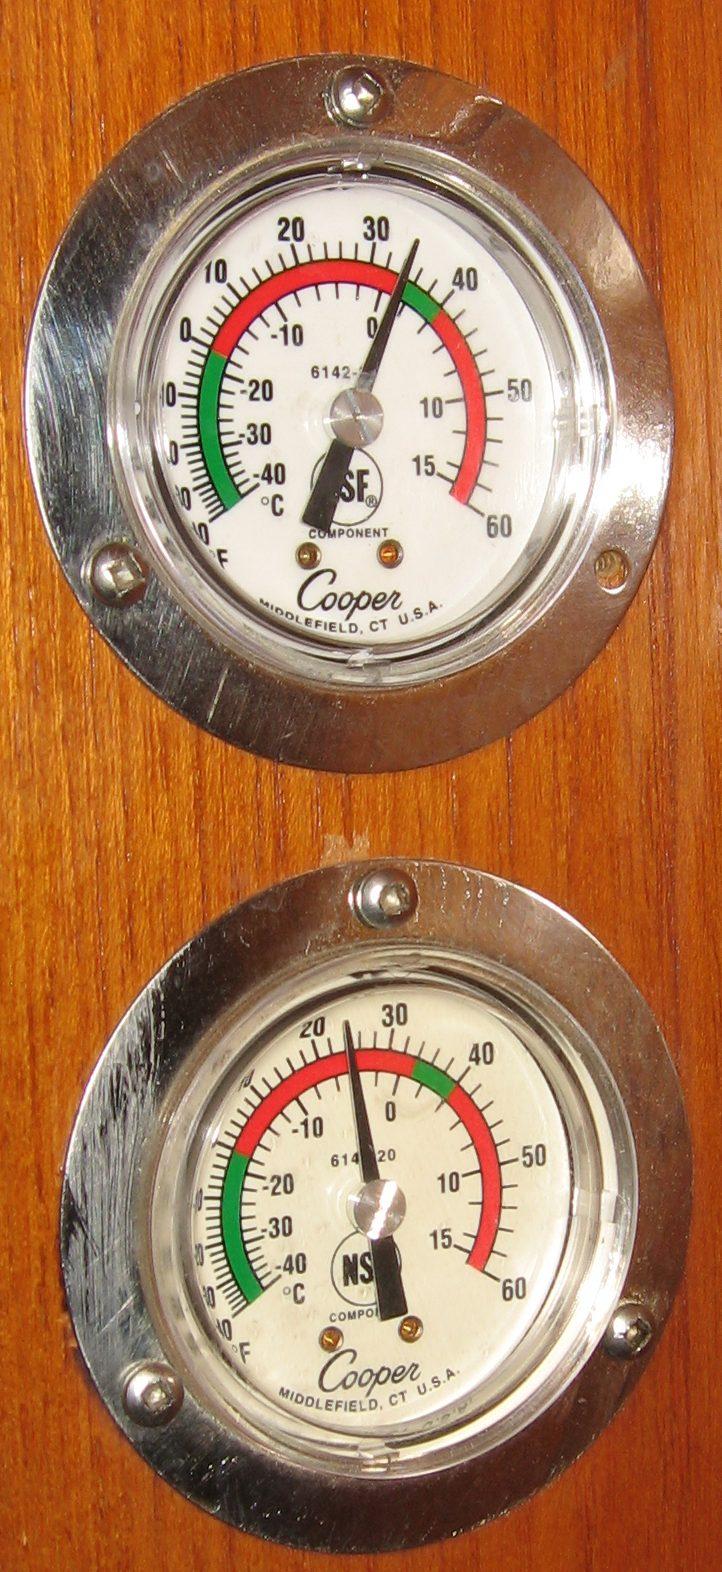 Click image for larger version  Name:acfridge-gauges.jpg Views:132 Size:243.6 KB ID:53440